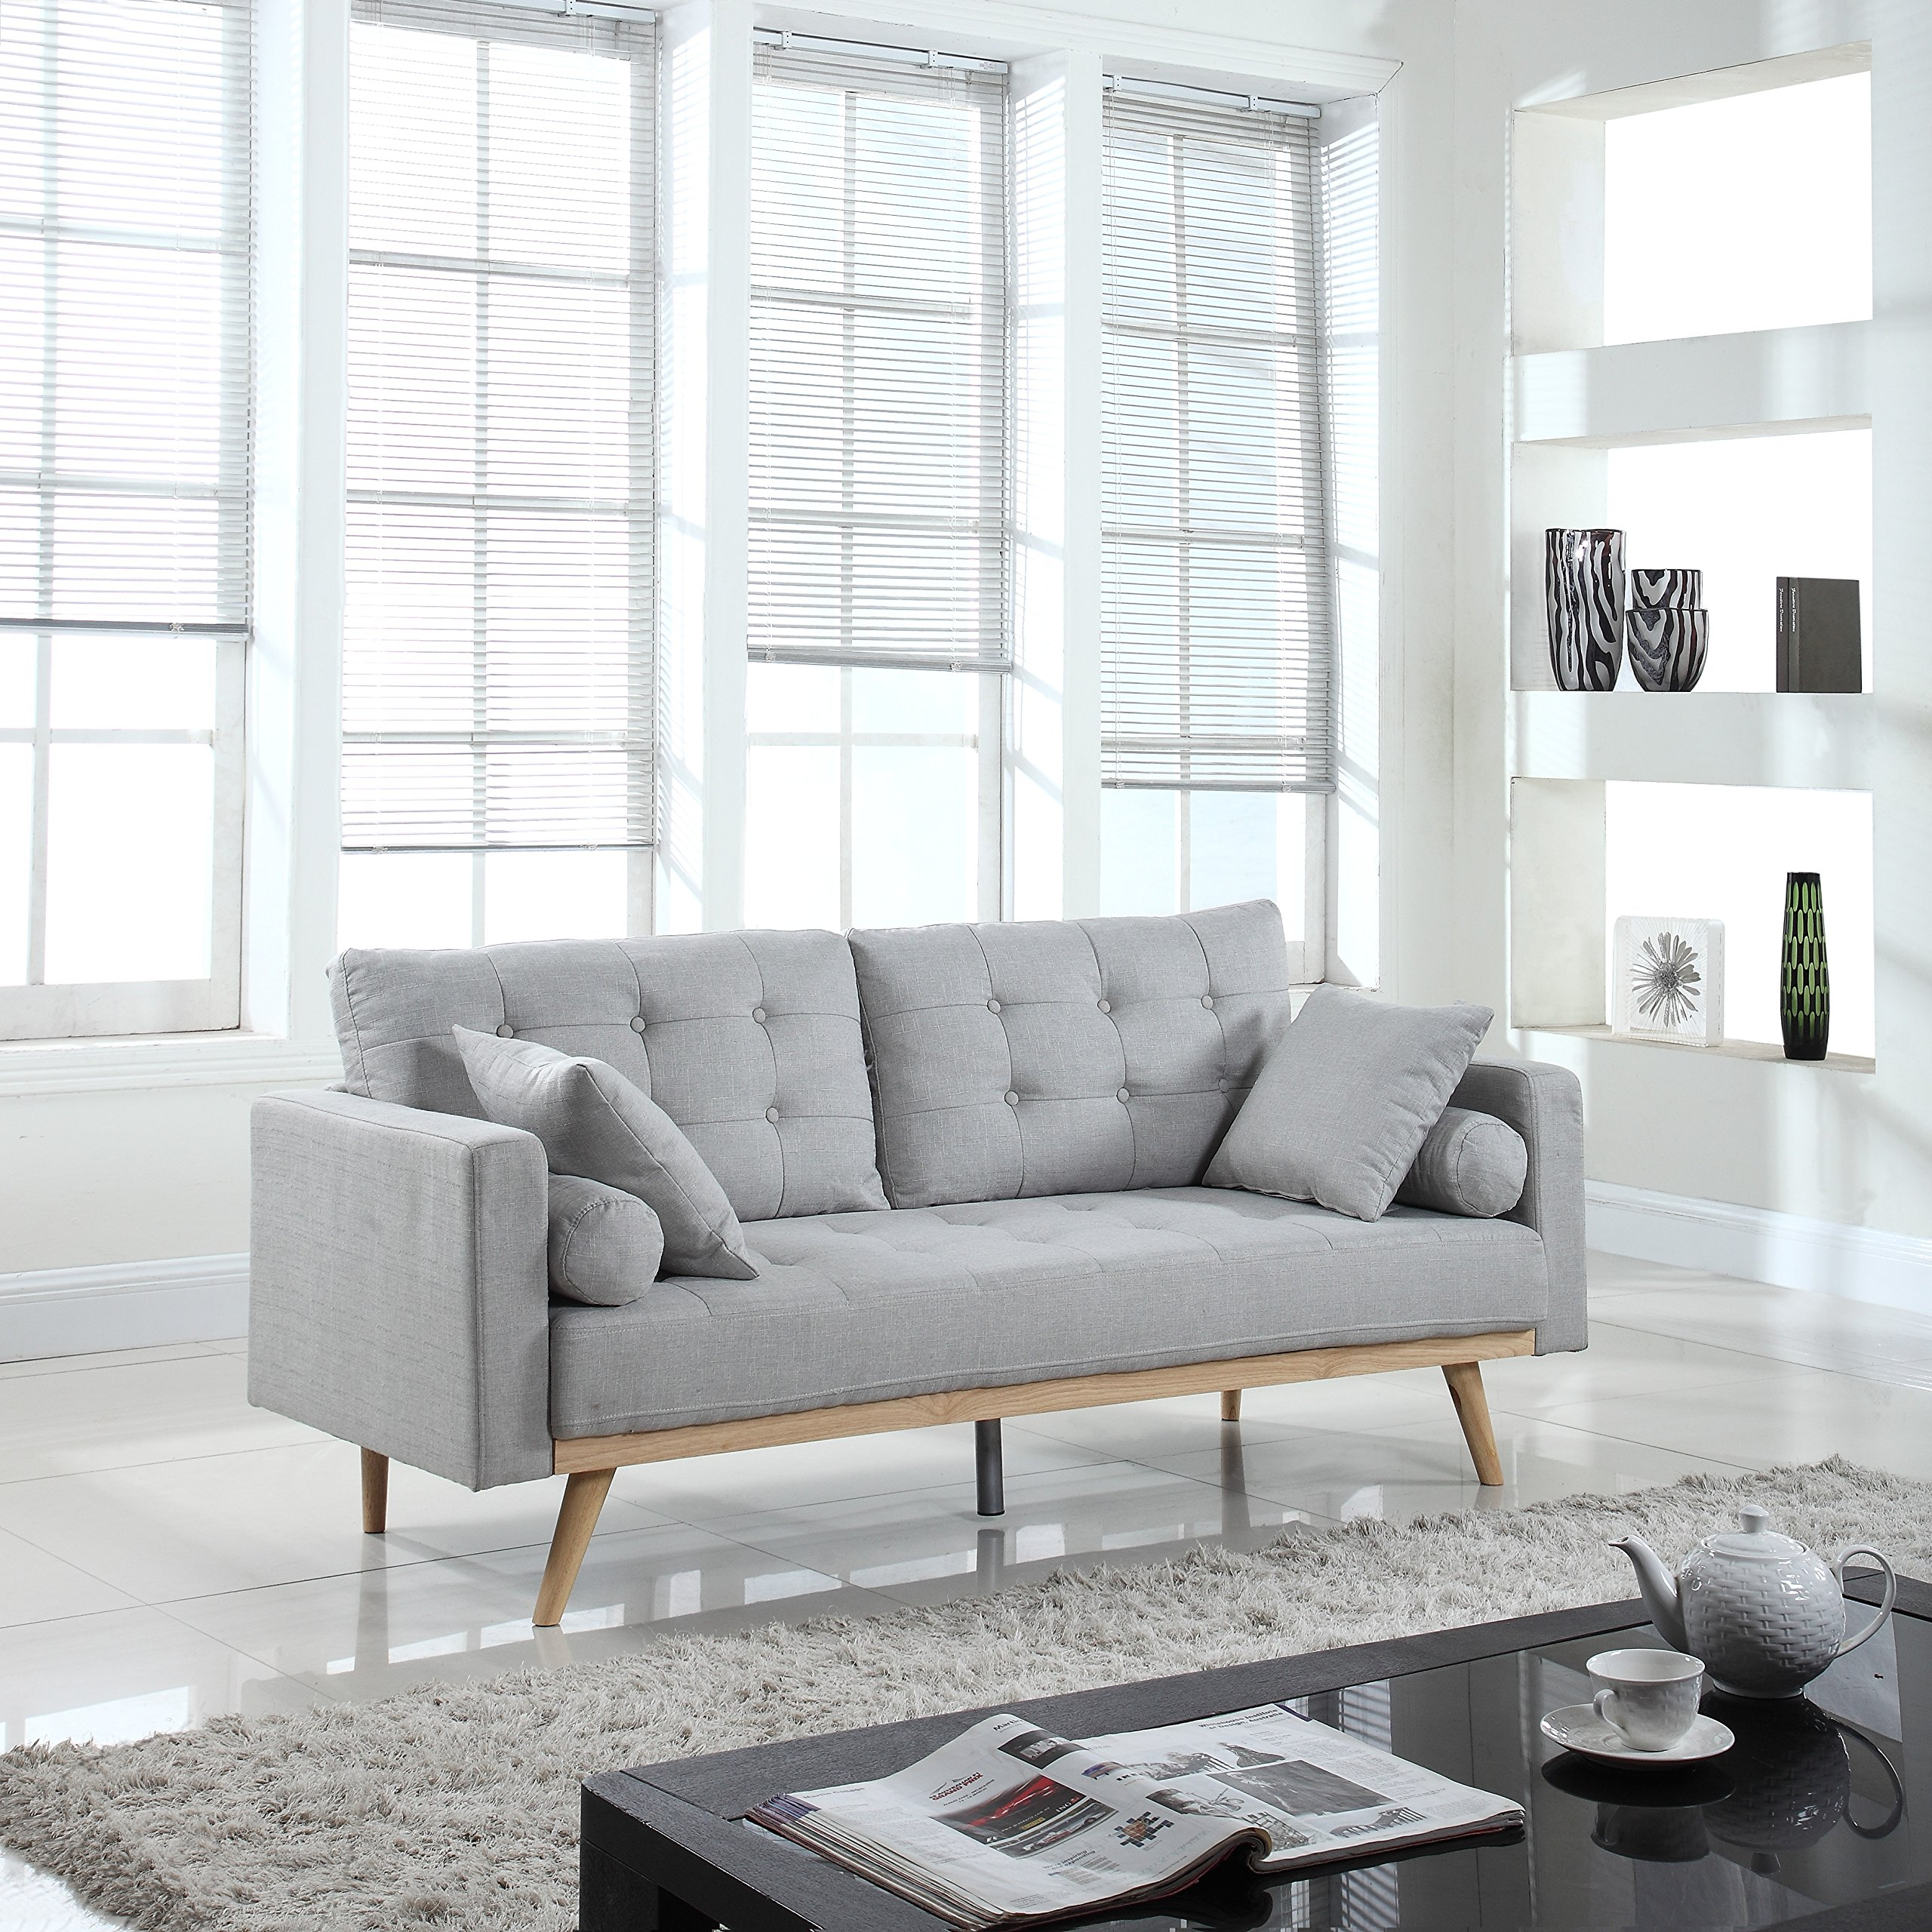 Mid Century Modern Tufted Linen Fabric Sofa Light Grey